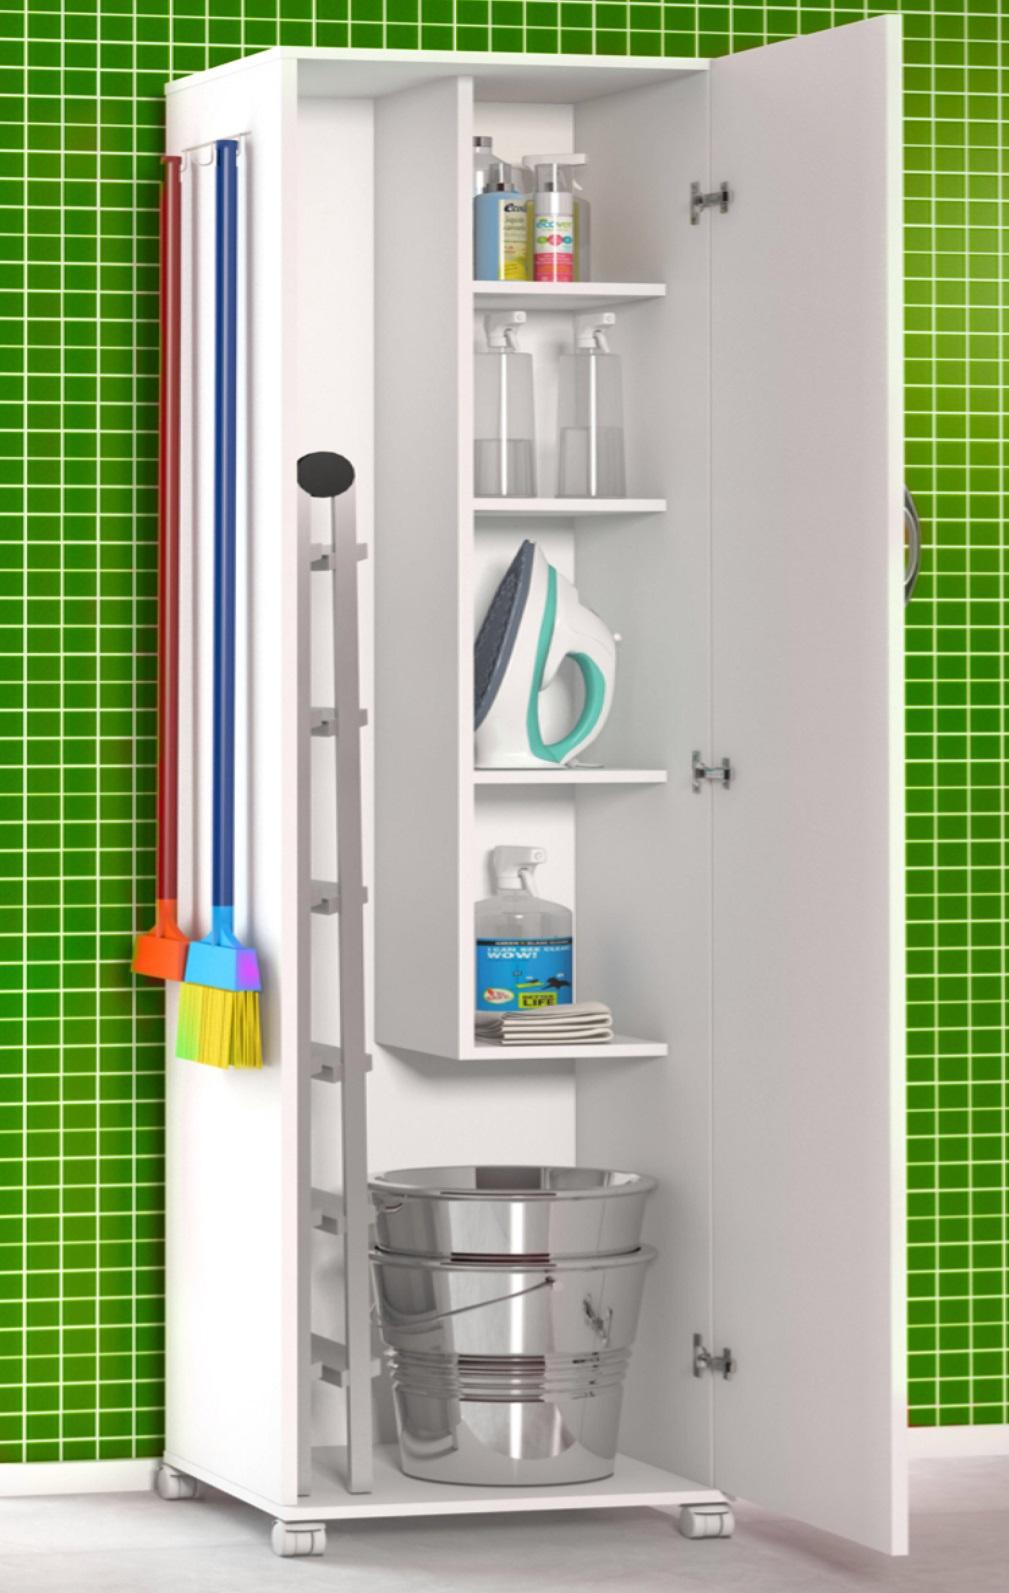 Armário Branco Alto Lavanderia Organizar Produtos de Limpeza